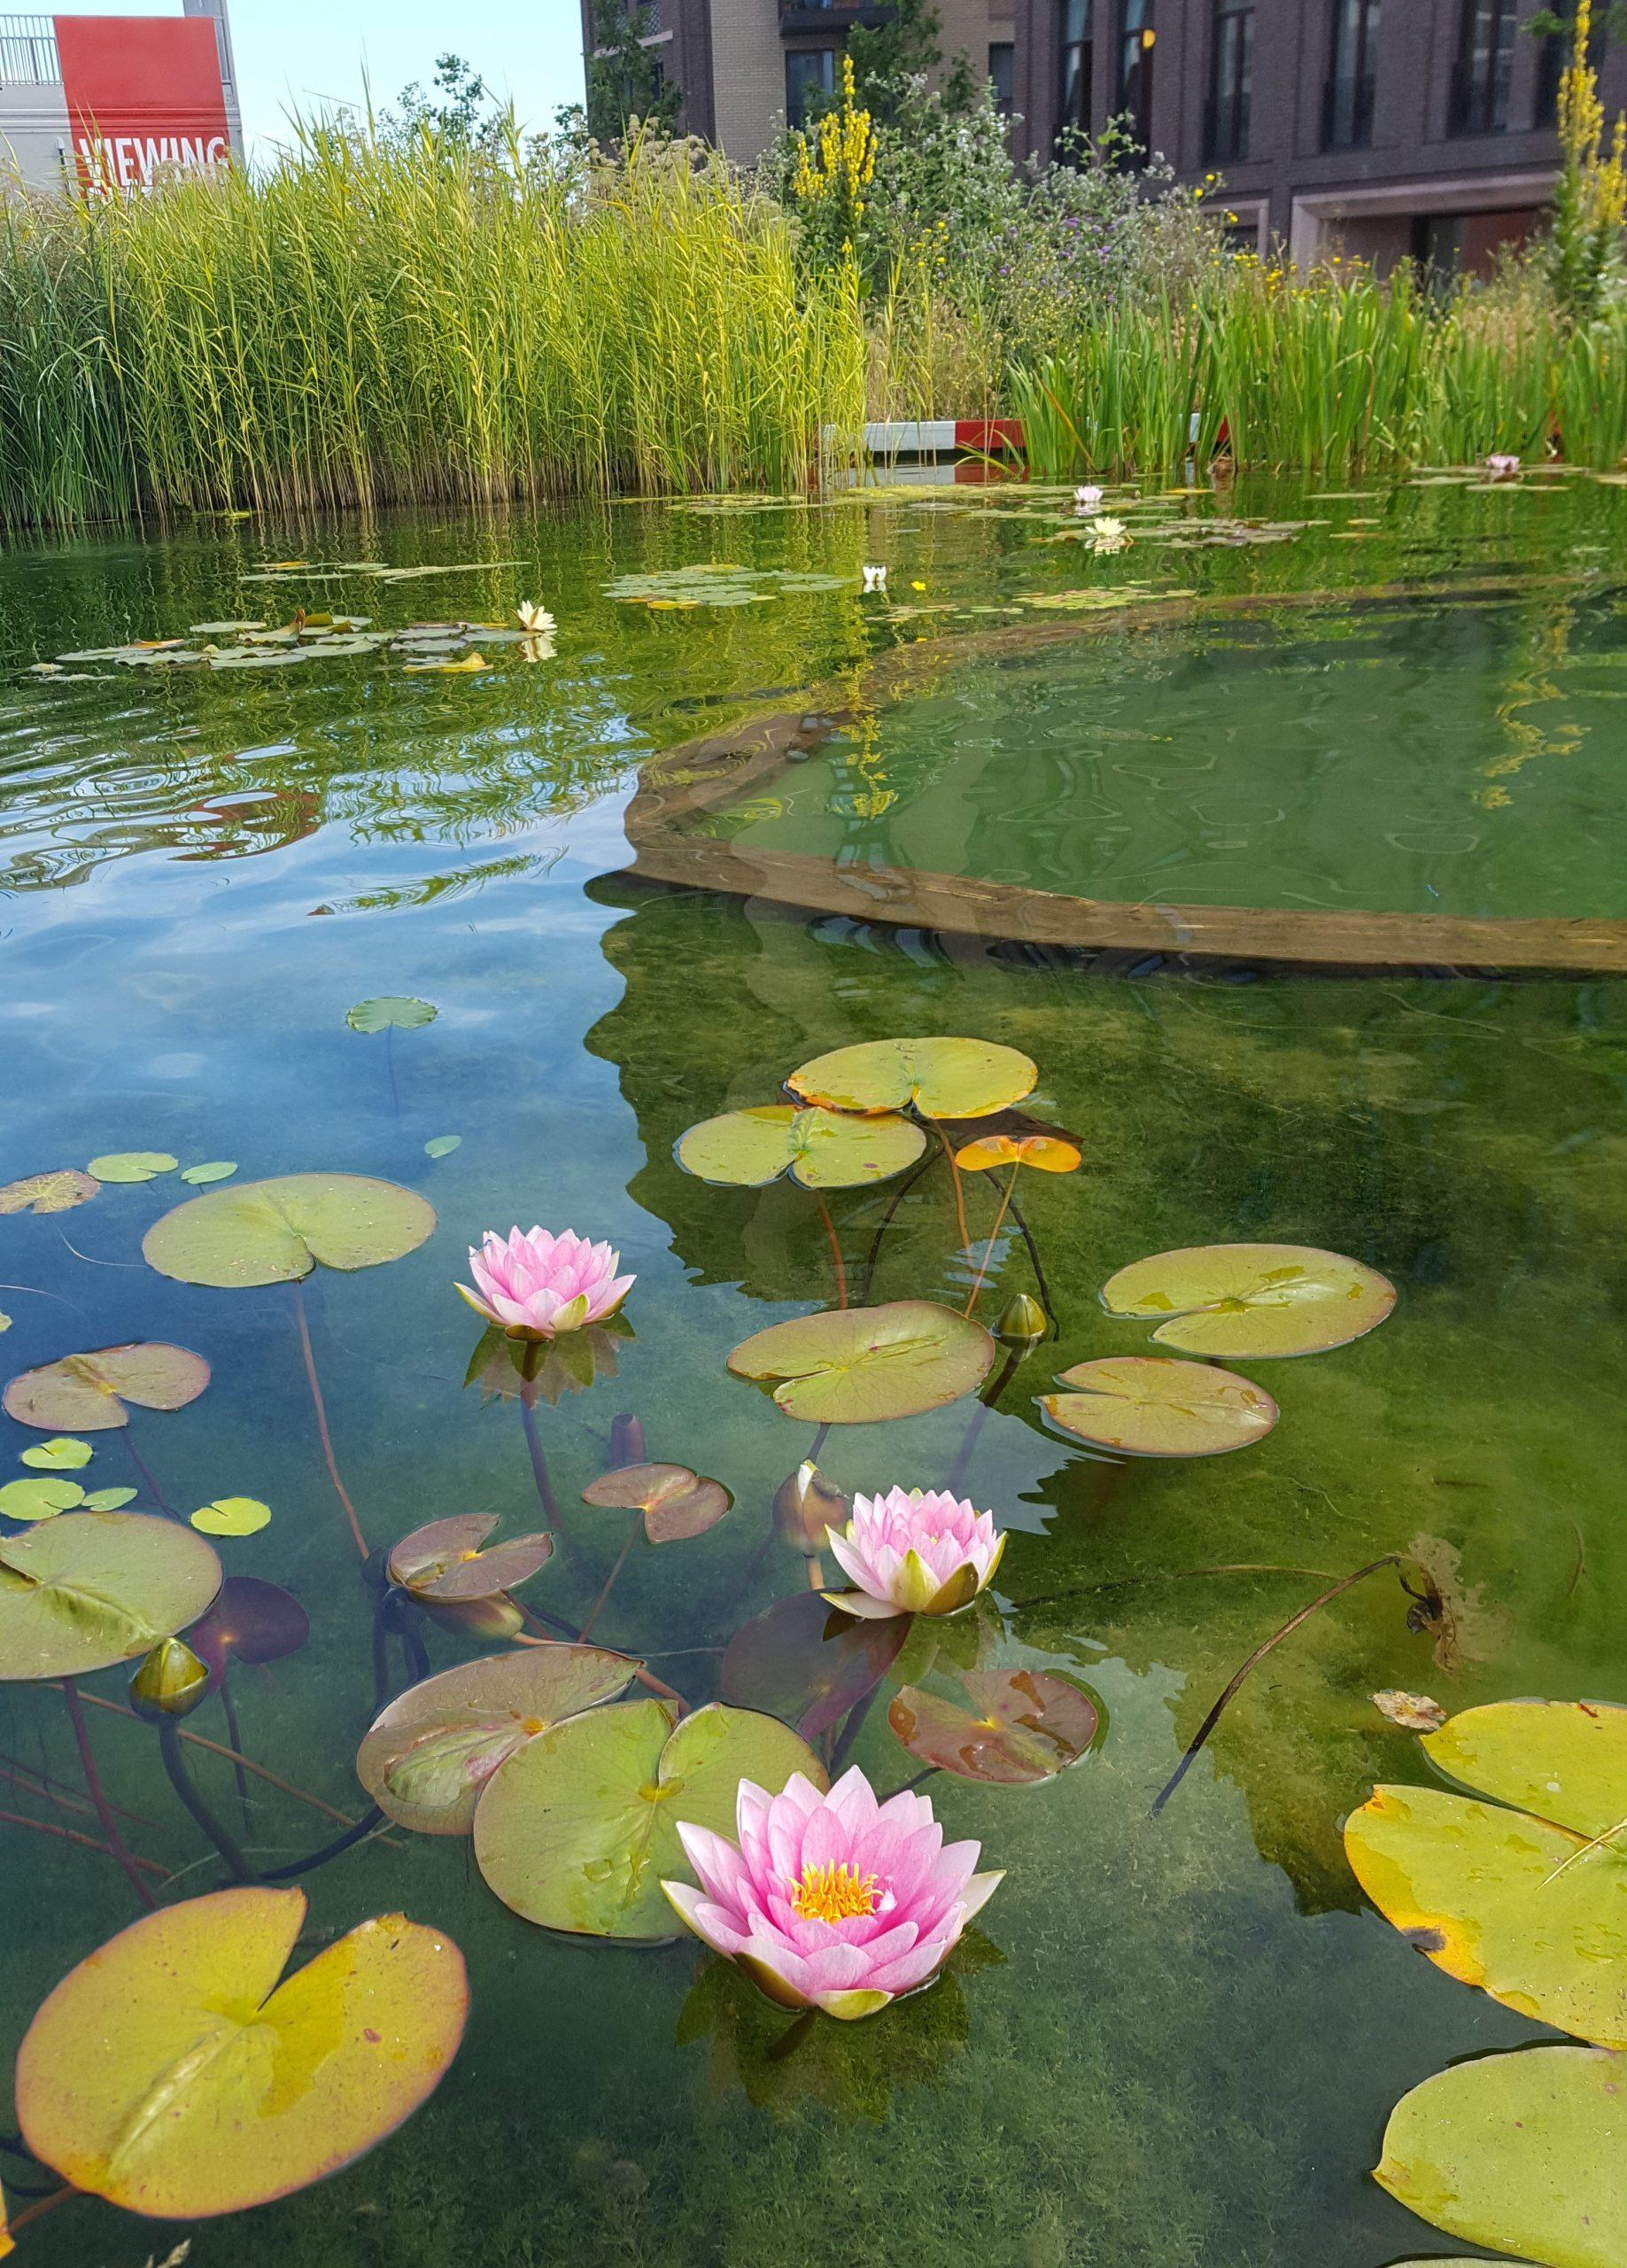 King Cross Pond Club Lily